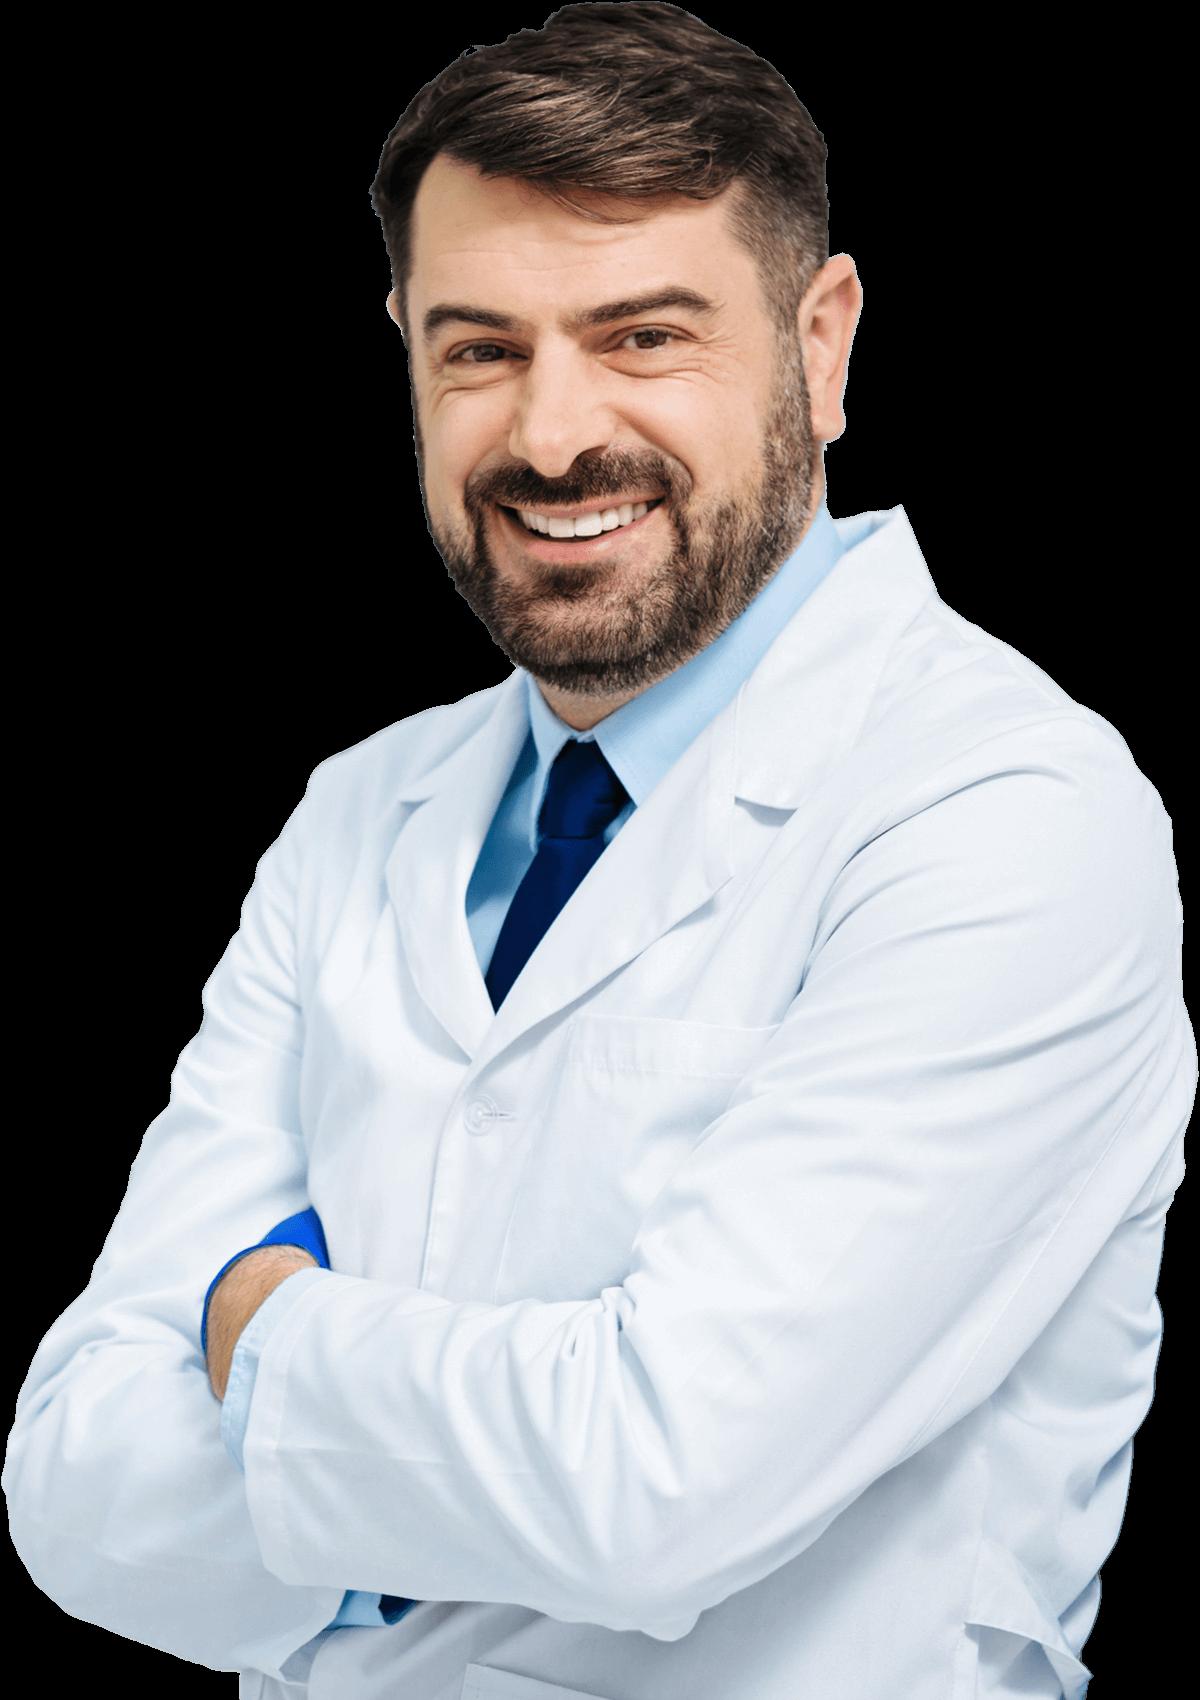 https://kamaltdinov.ru/wp-content/uploads/2020/02/doctor-2.png